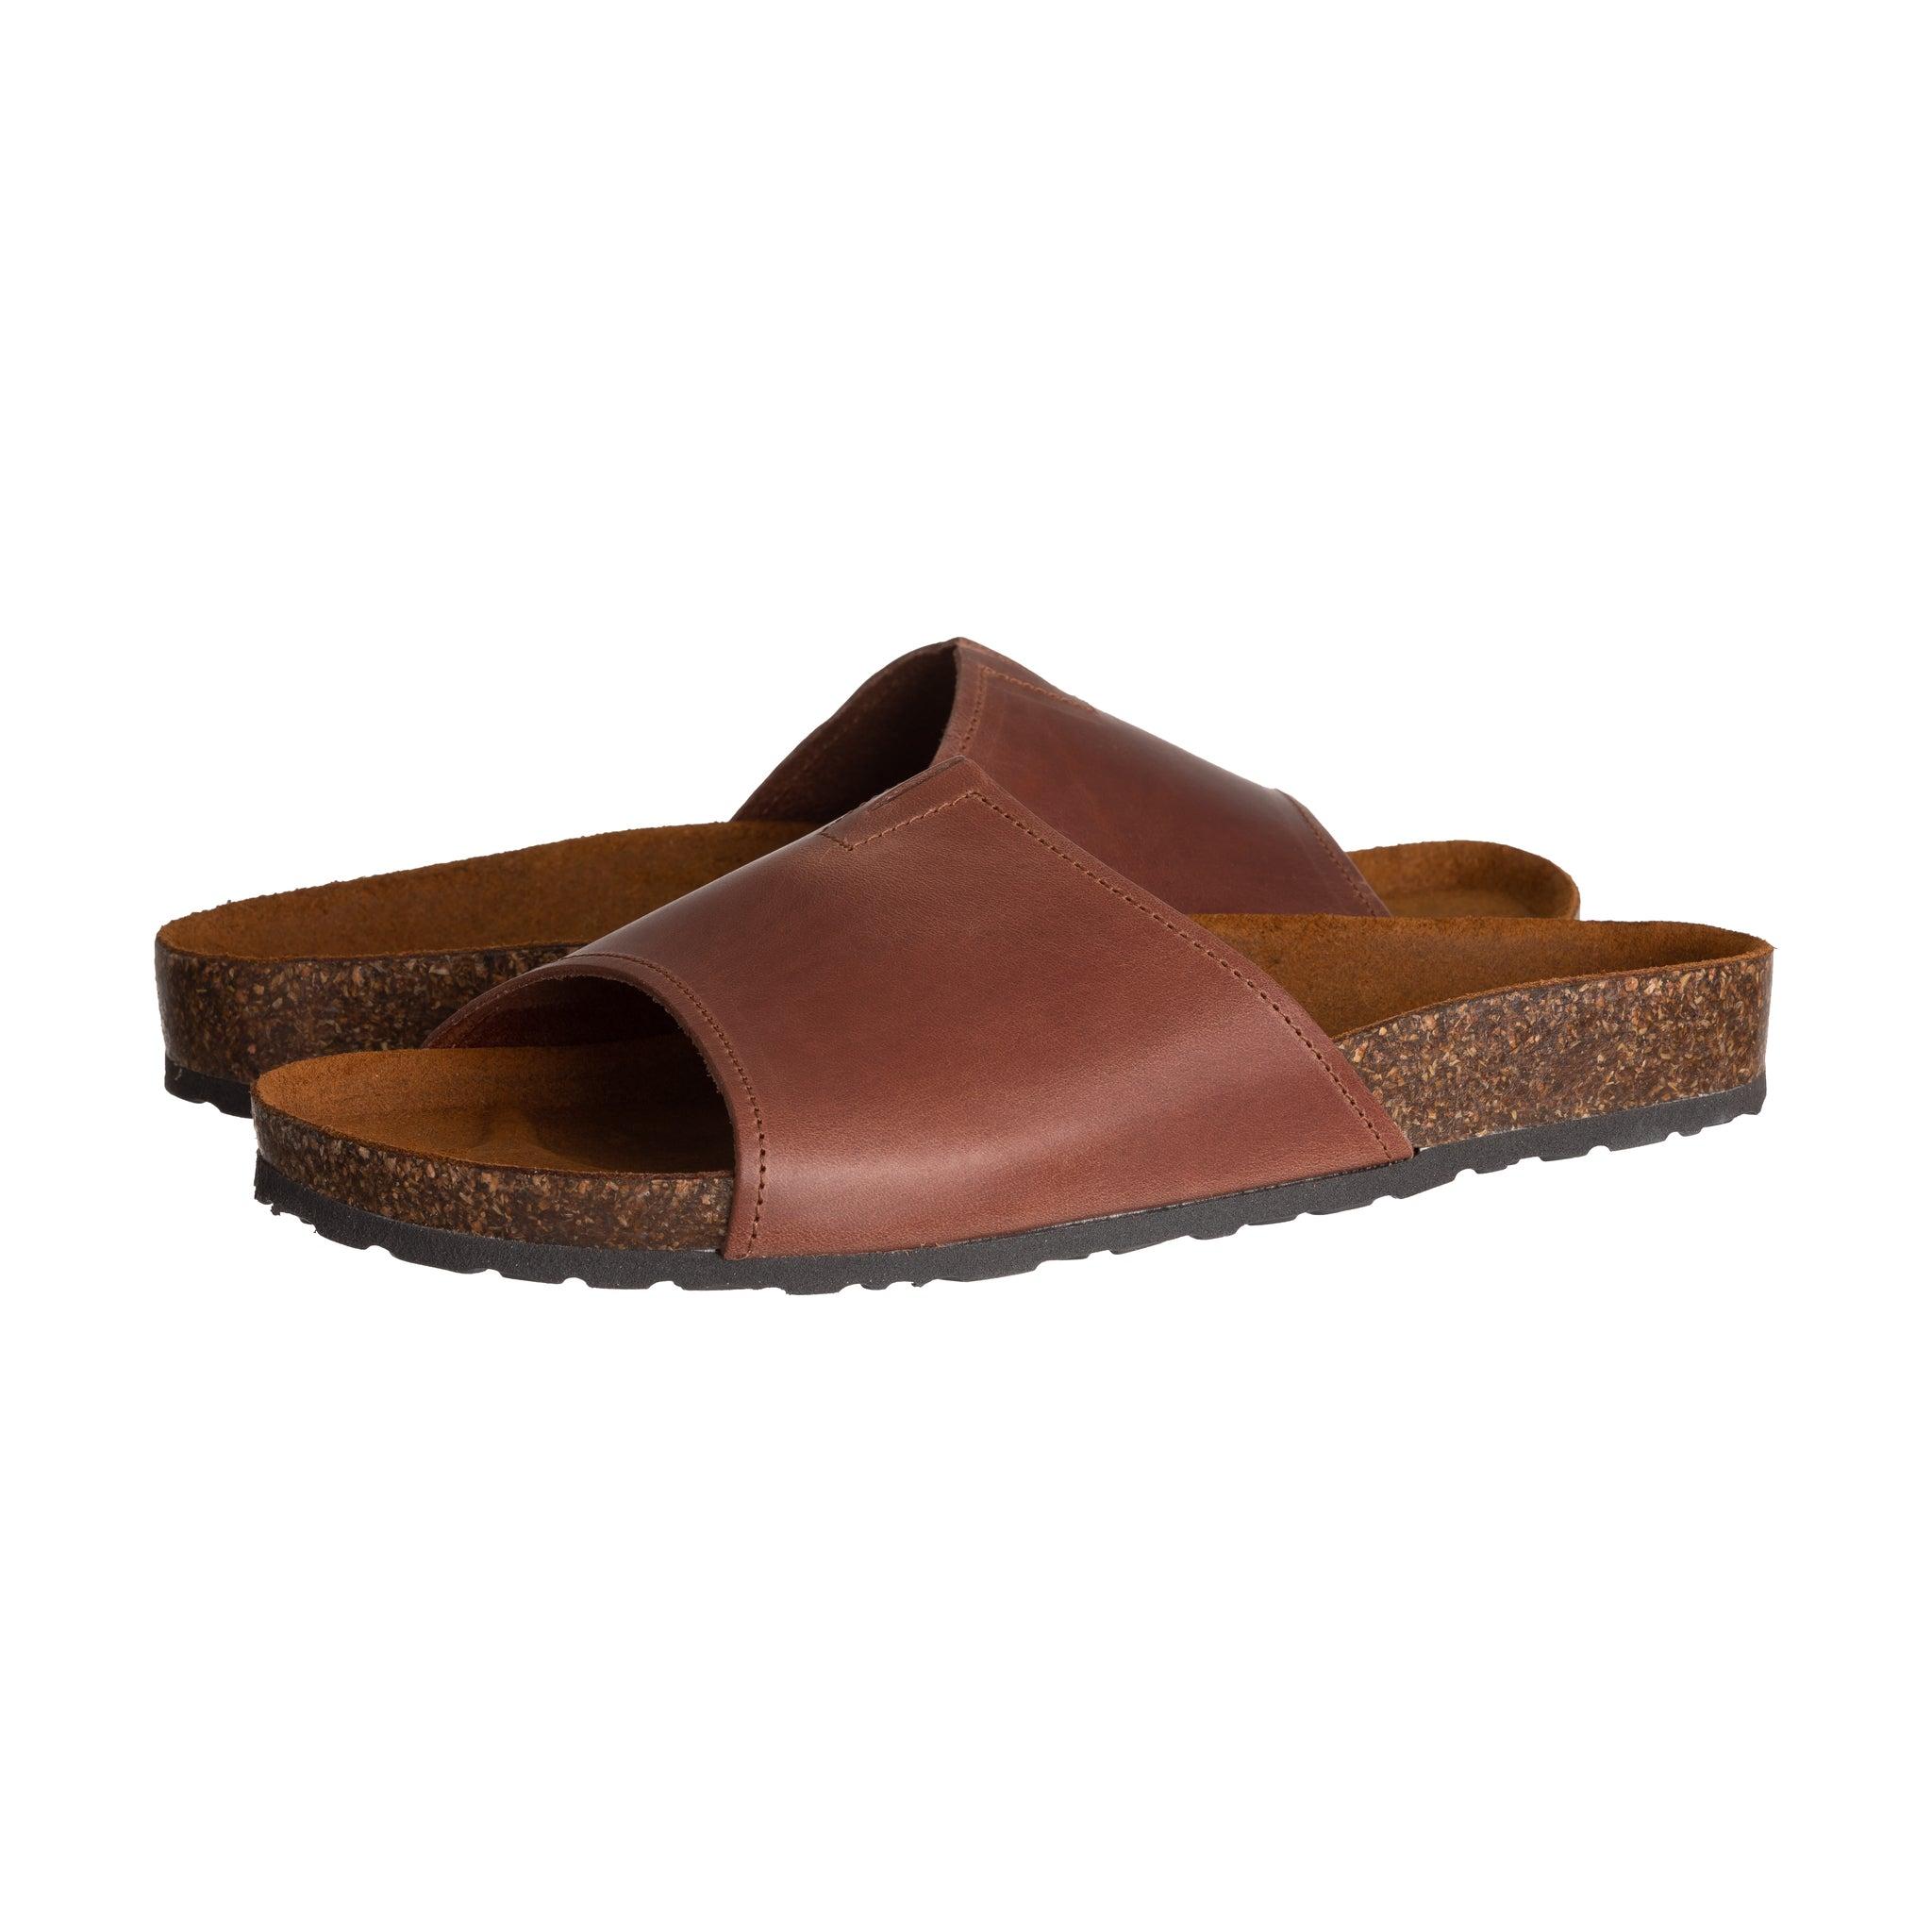 Duccelli Beau Cognac Men's Italian Slip-On Sandal - Discount Italian Shoes